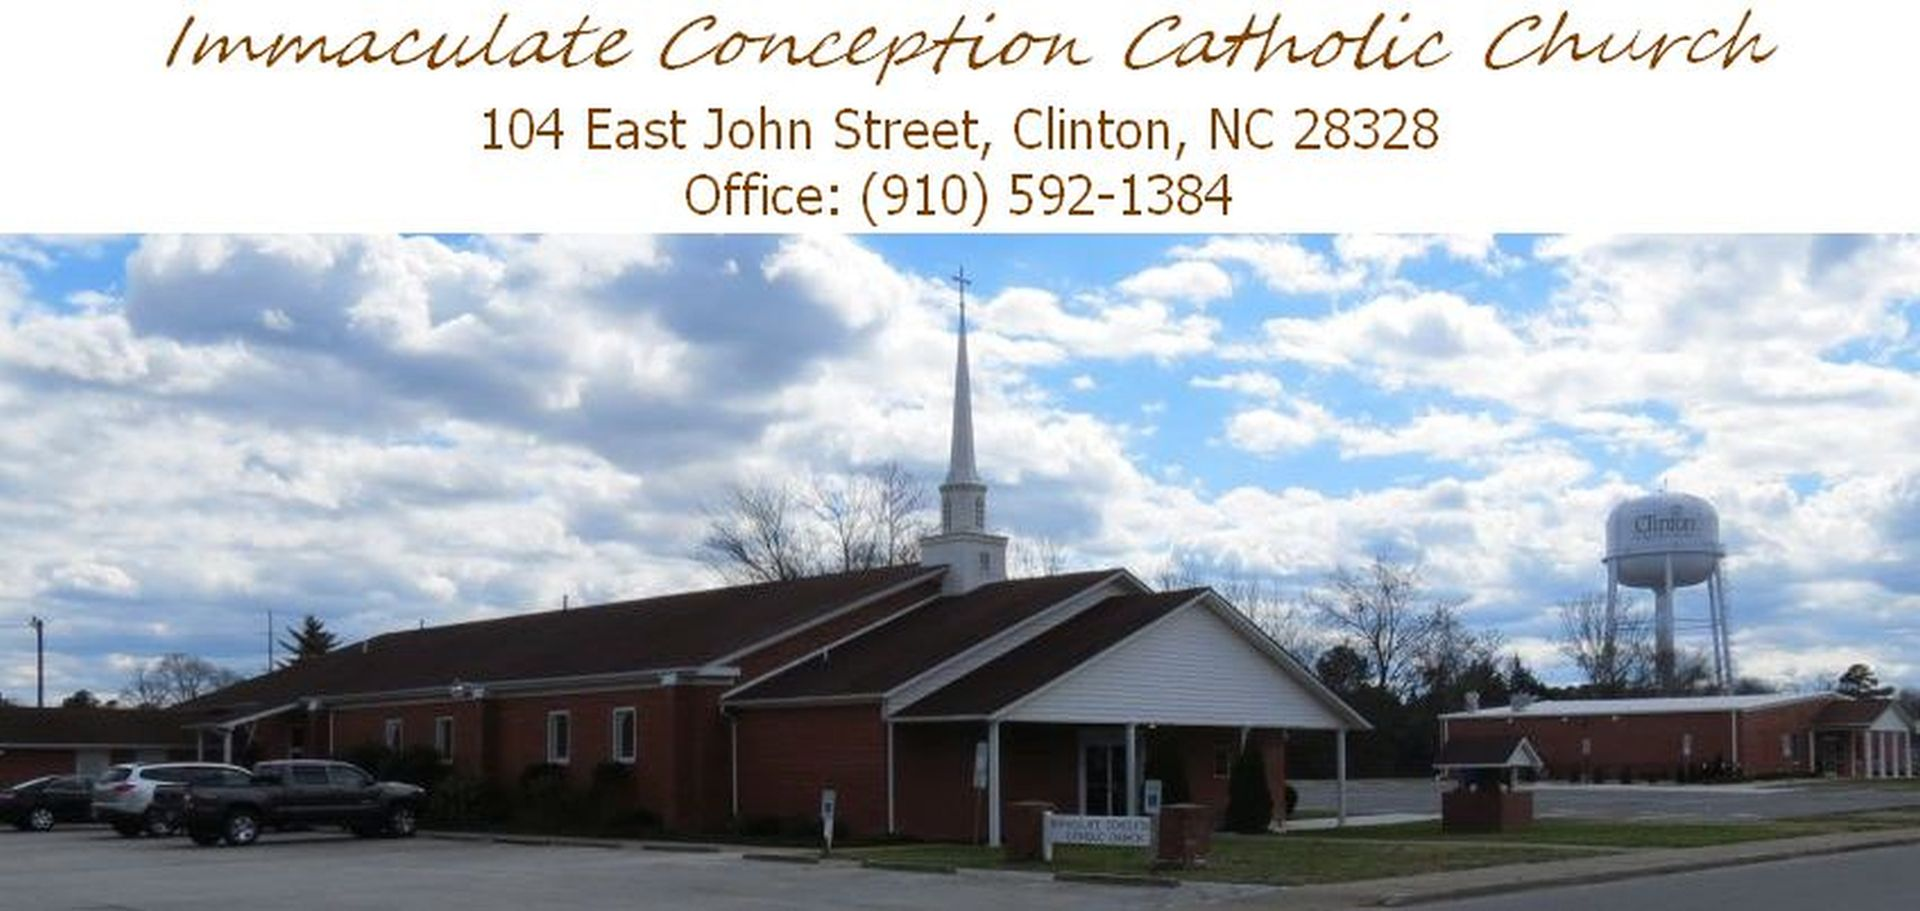 Imaculate Conception Catholic Church